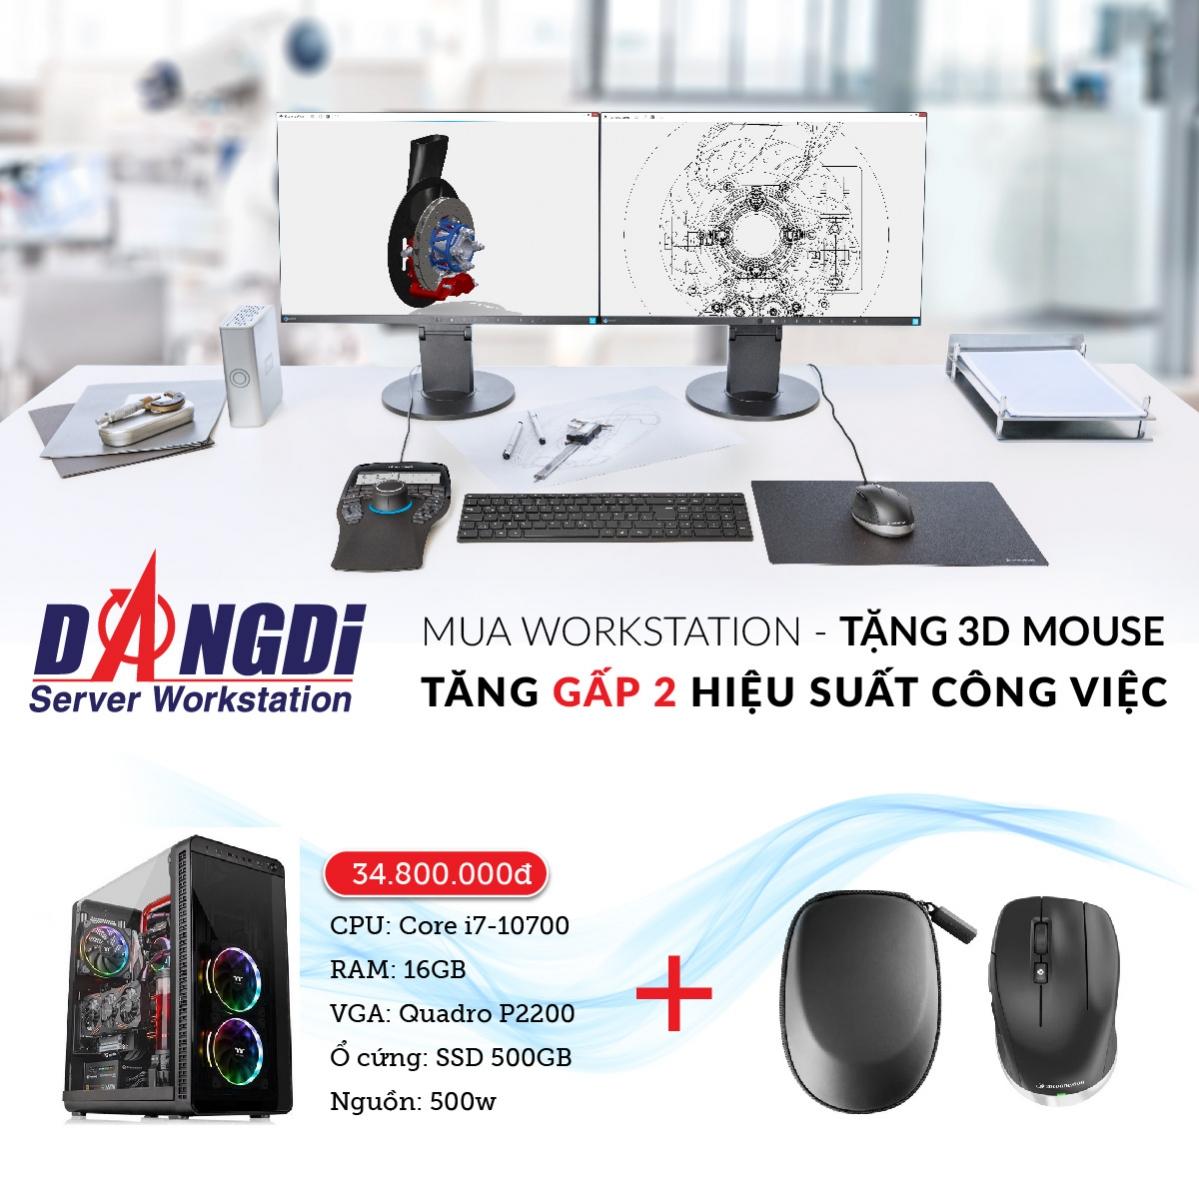 Mua workstation - Tặng 3D mouse